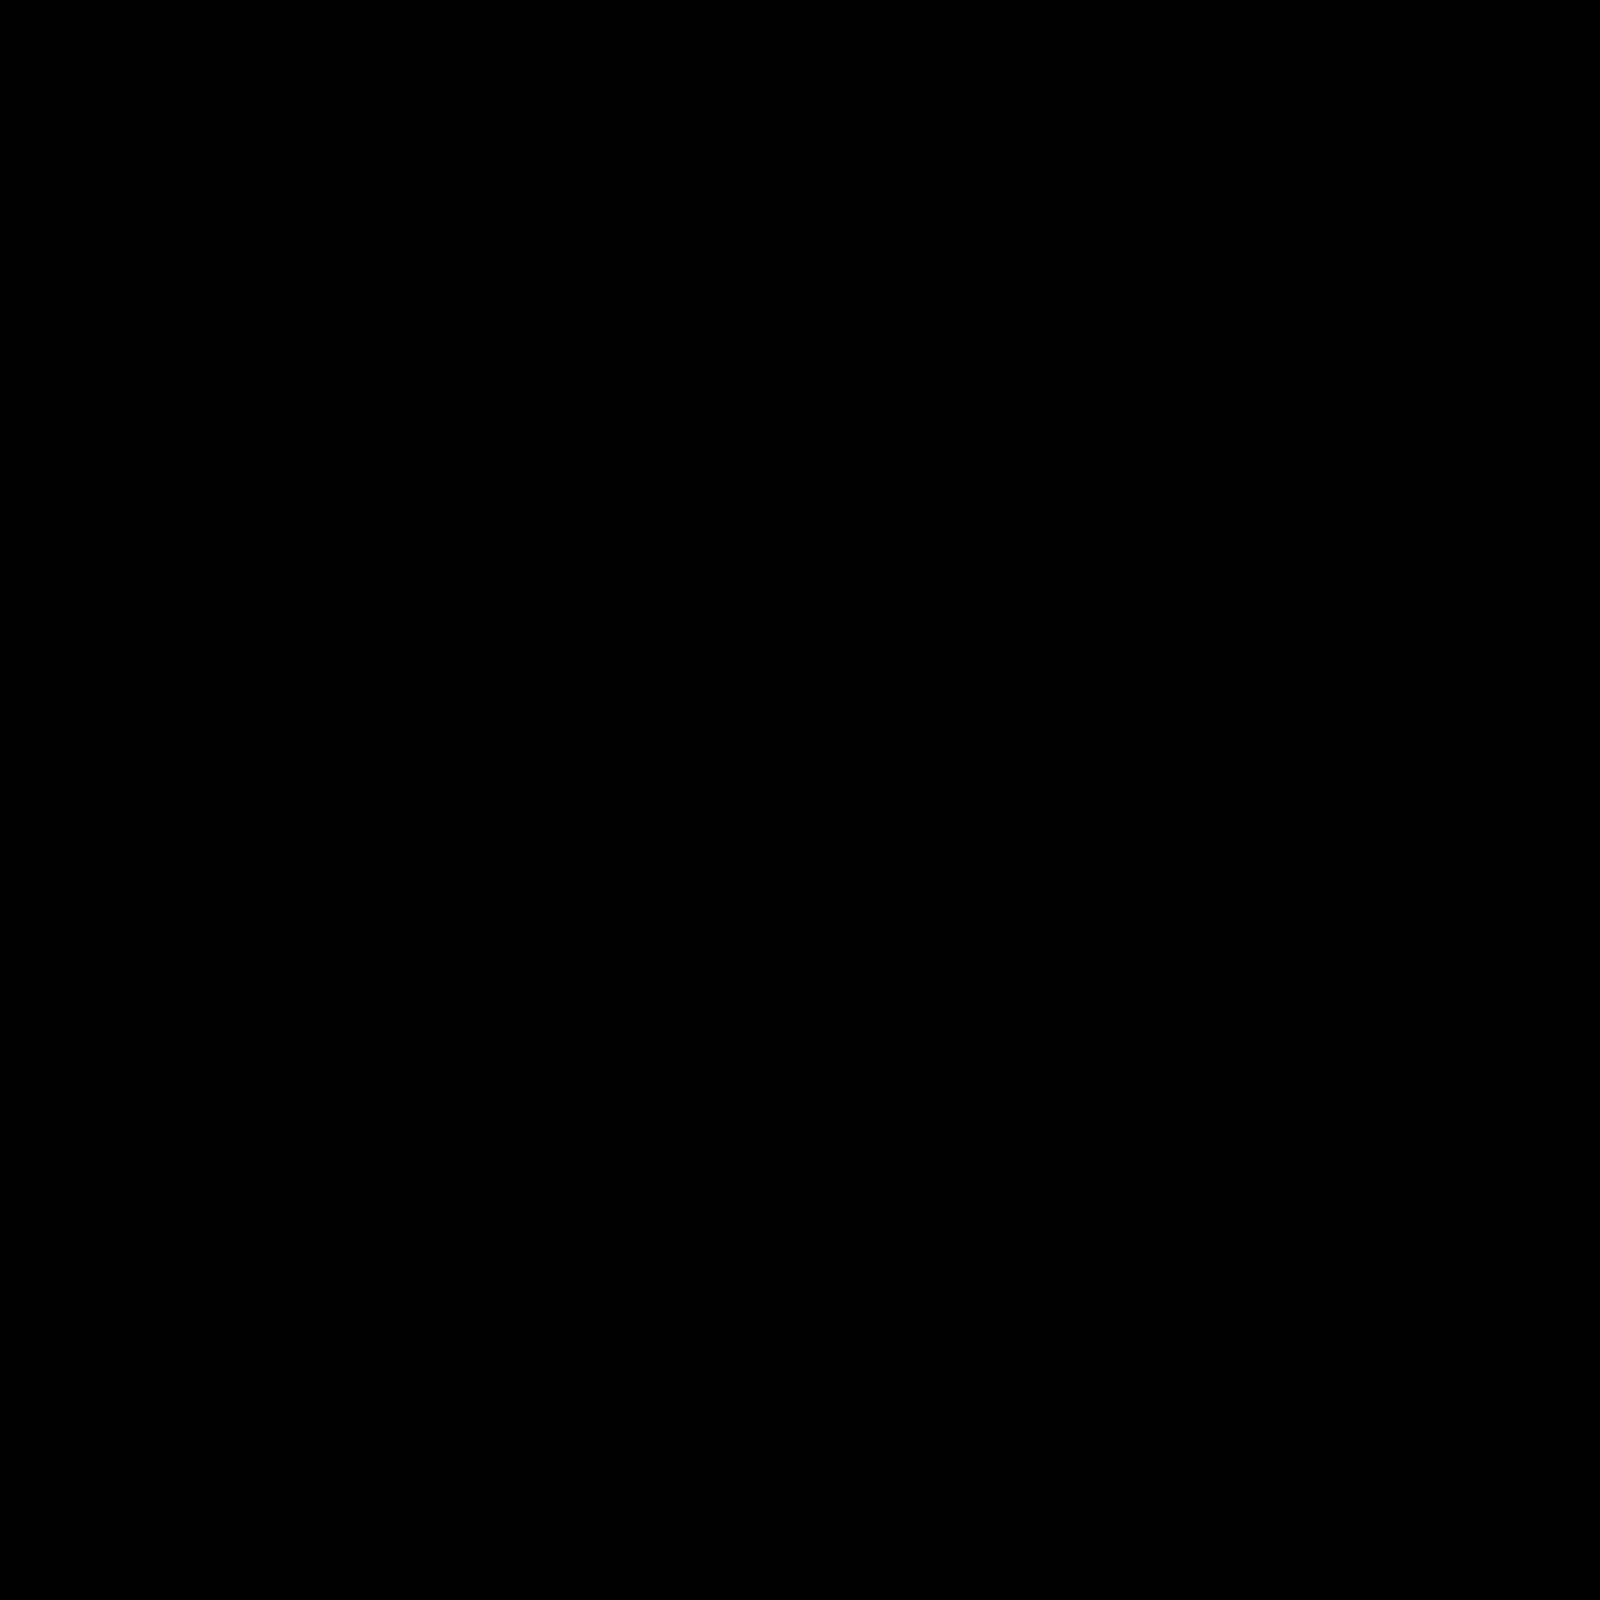 recepcja icon